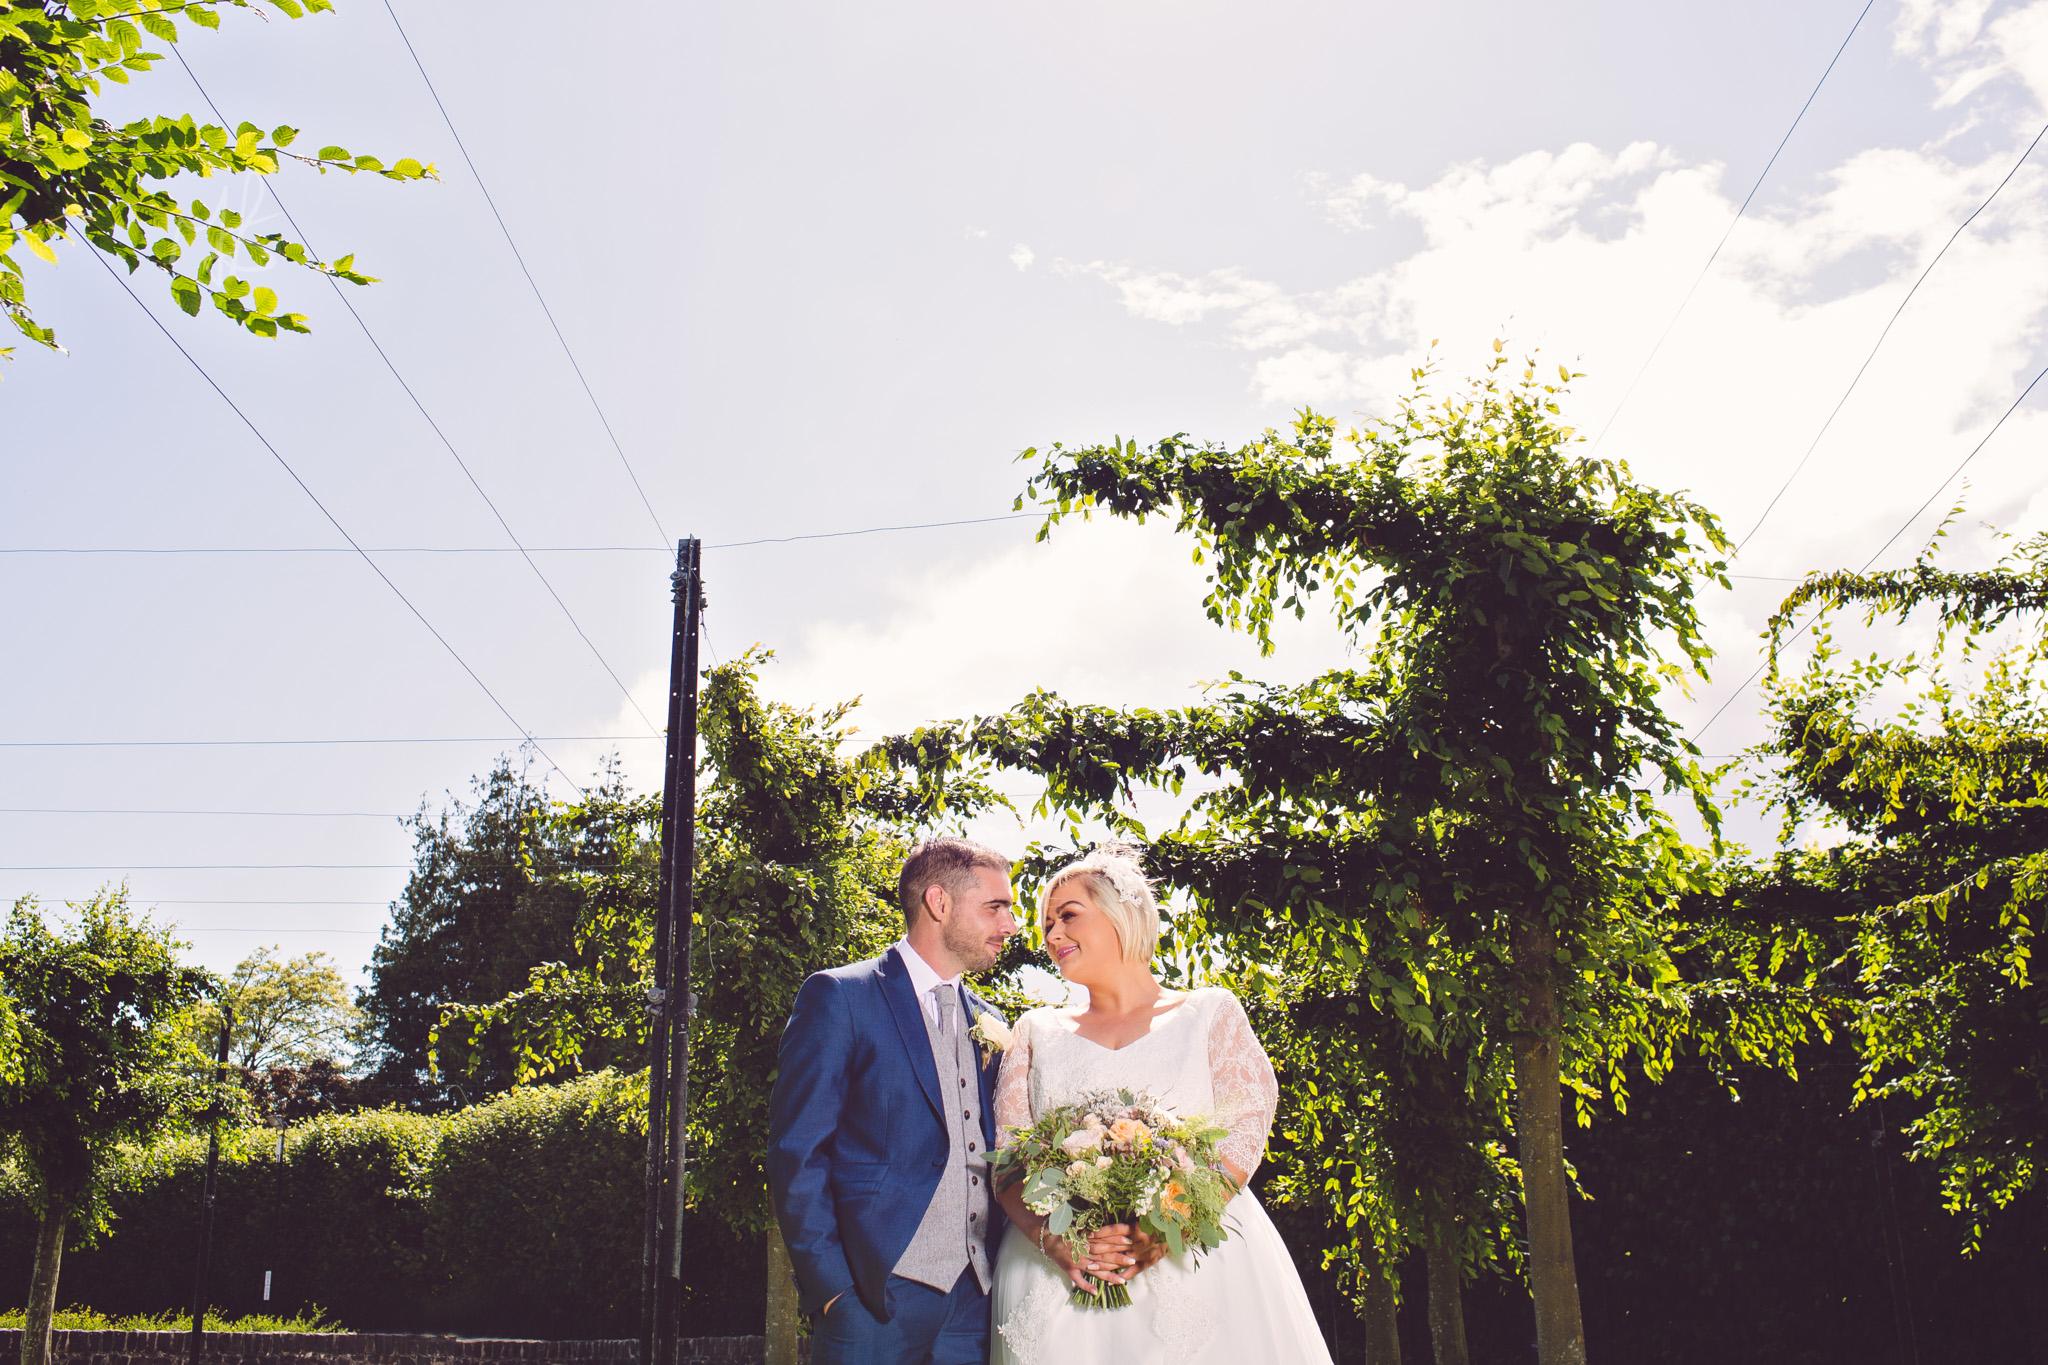 Northern-Ireland-Wedding-Photographer-Mark-Barnes-Ballymena_wedding-photography-Leighinmohr-House-Seamas_Alanna_For-web-29.jpg